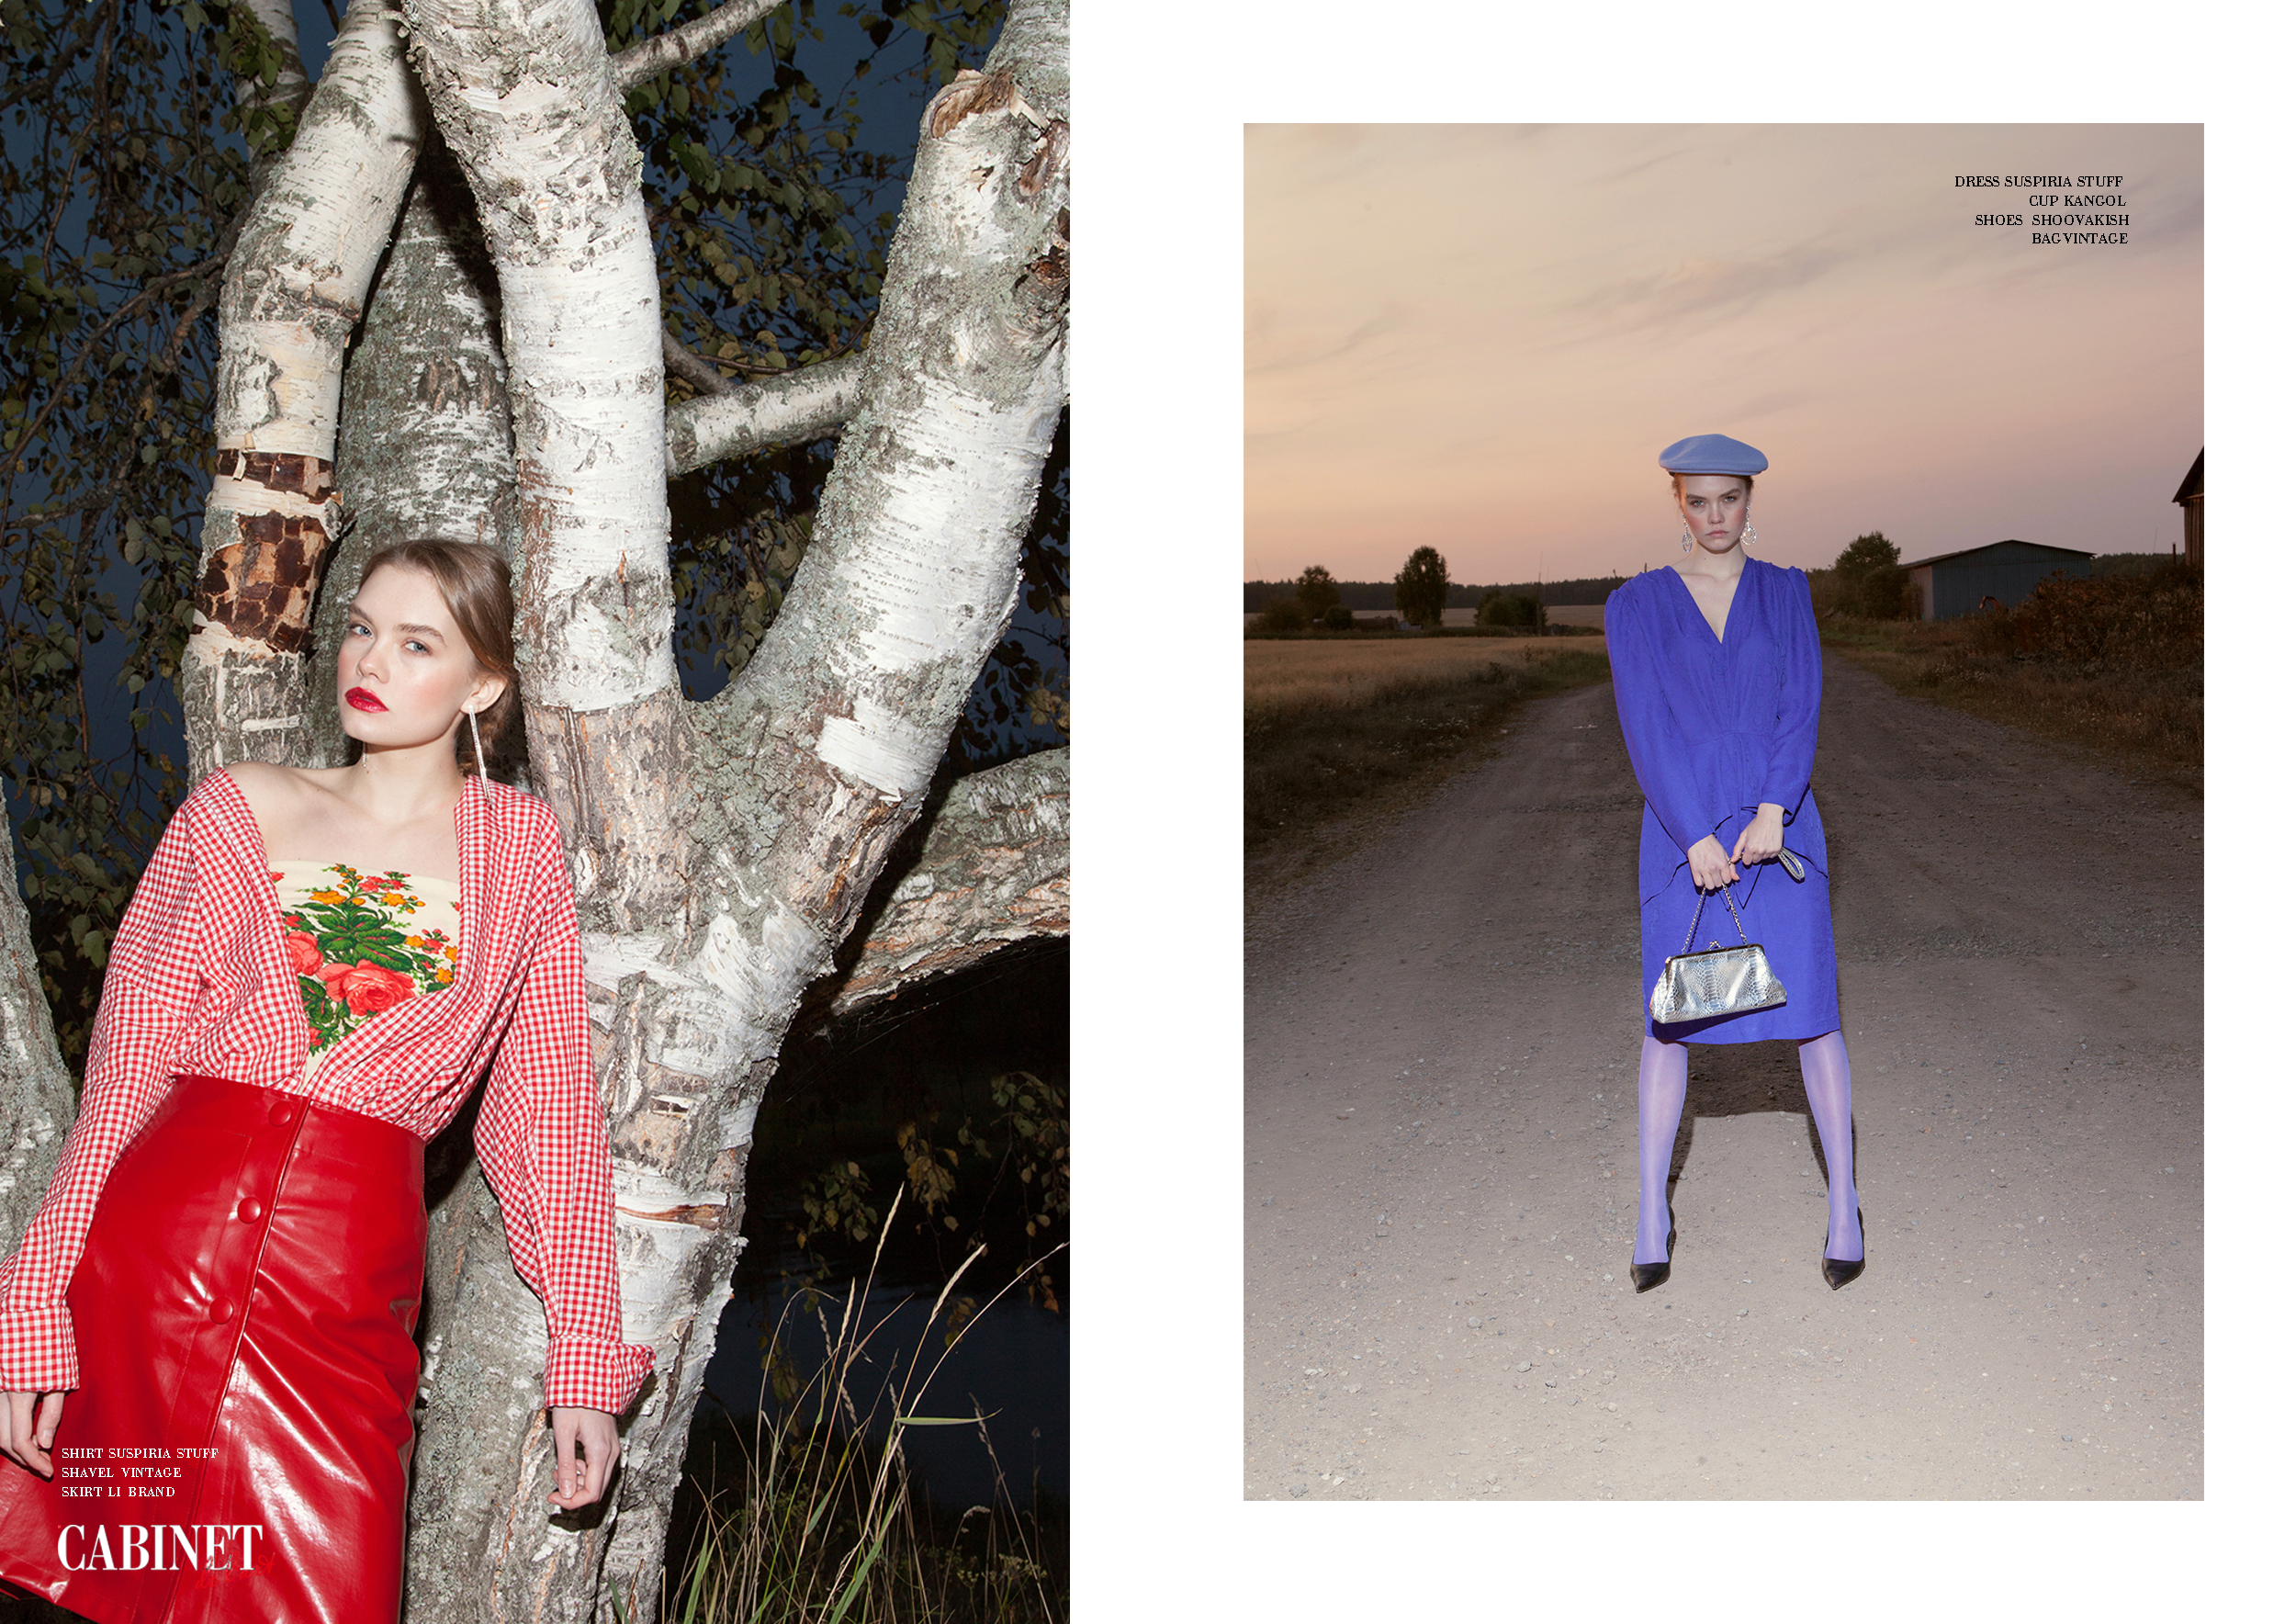 Справа: Shirt Suspiria Stuff Shavel vintage,Skirt Li Brand ; Слева:Dress Suspiria Stuff Cup Kangol Shoes Shoovakish, Bag Vintage